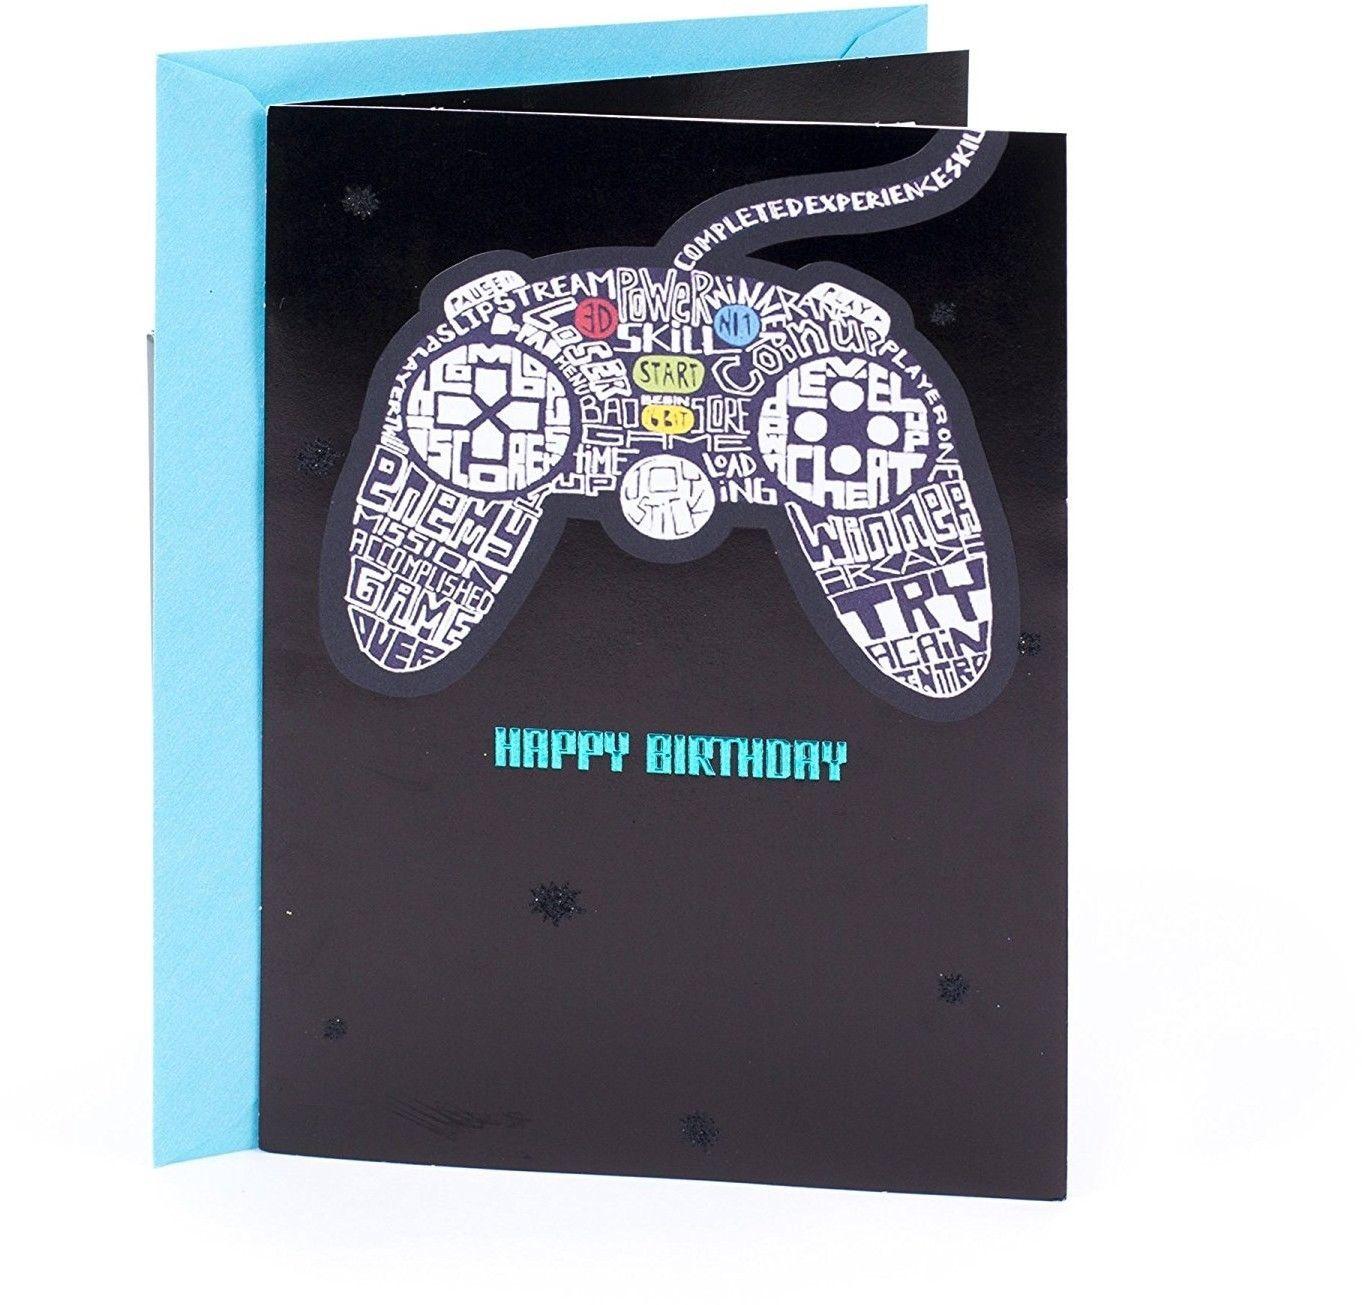 Hallmark Birthday Greeting Card For Him (Video Games Level Up) - $17.85